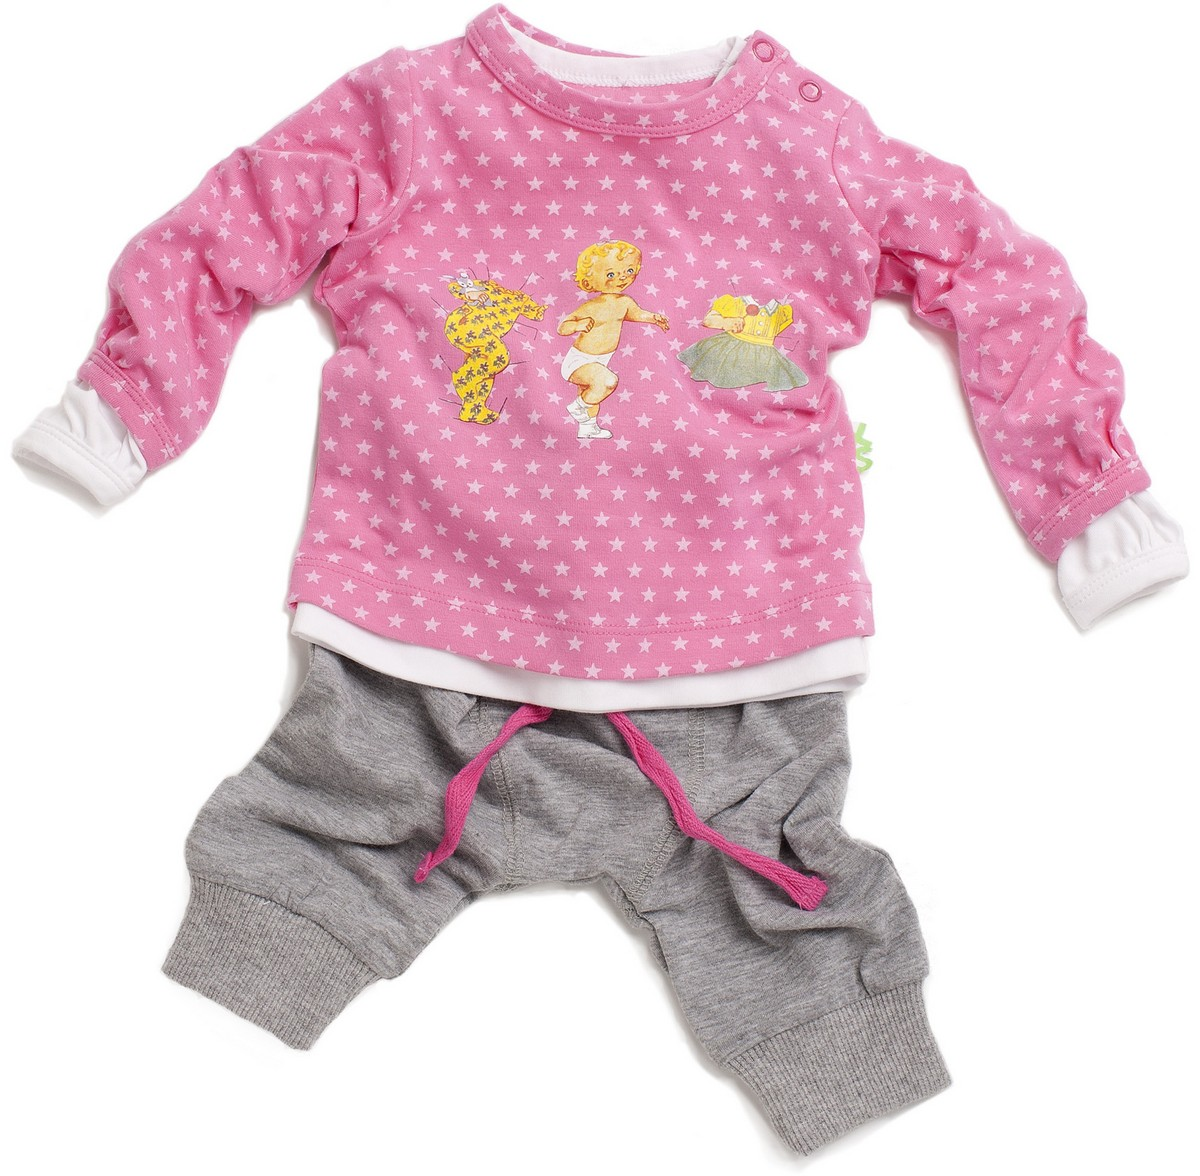 Webwinkel Babykleding.Online Kinderkleding Webwinkel Kleertjeshoek Merk Kinderkleding